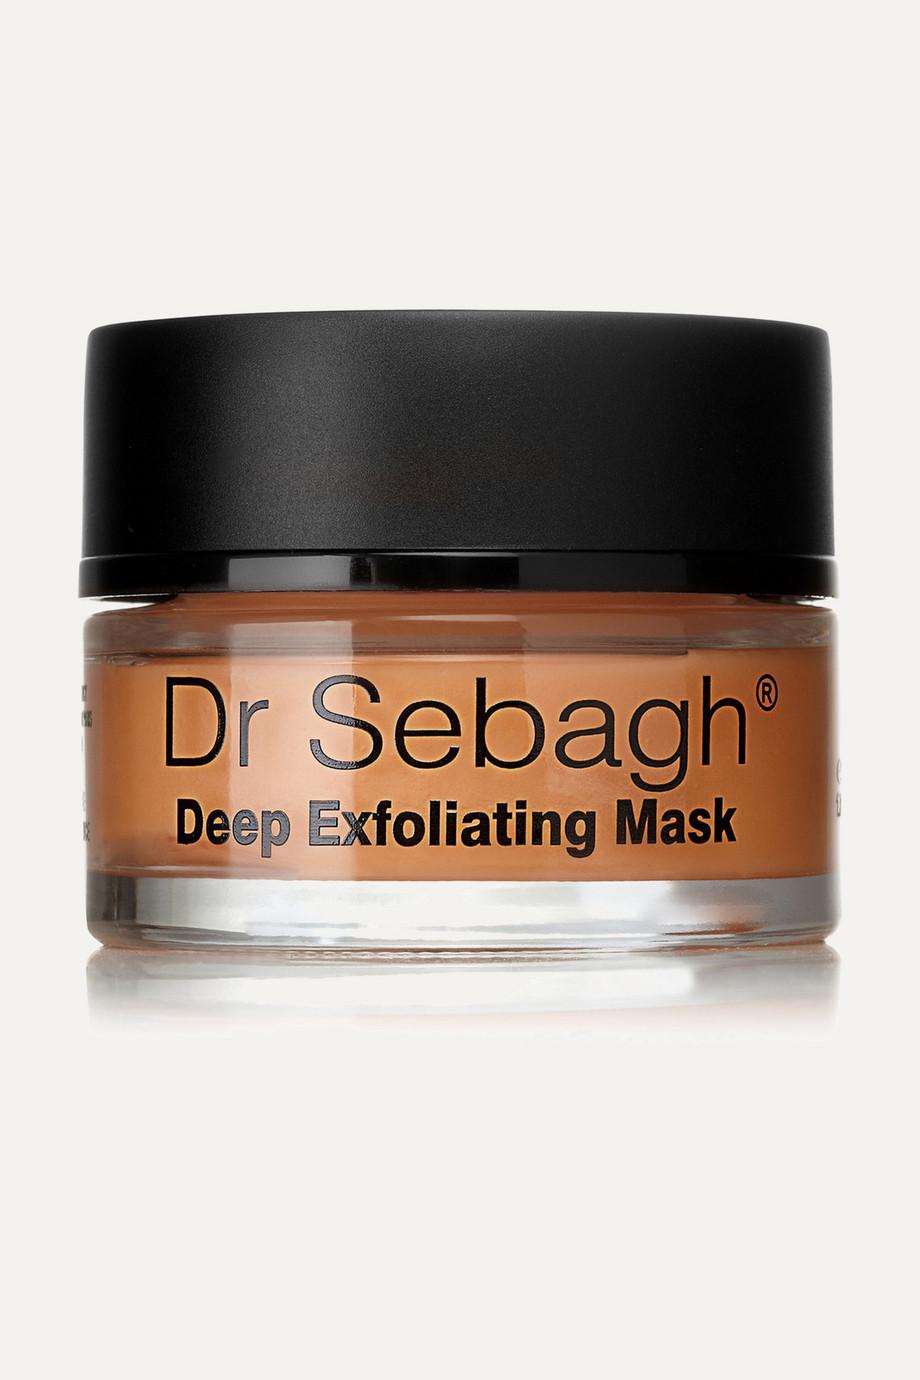 Dr Sebagh Masque exfoliant intense, 50 ml